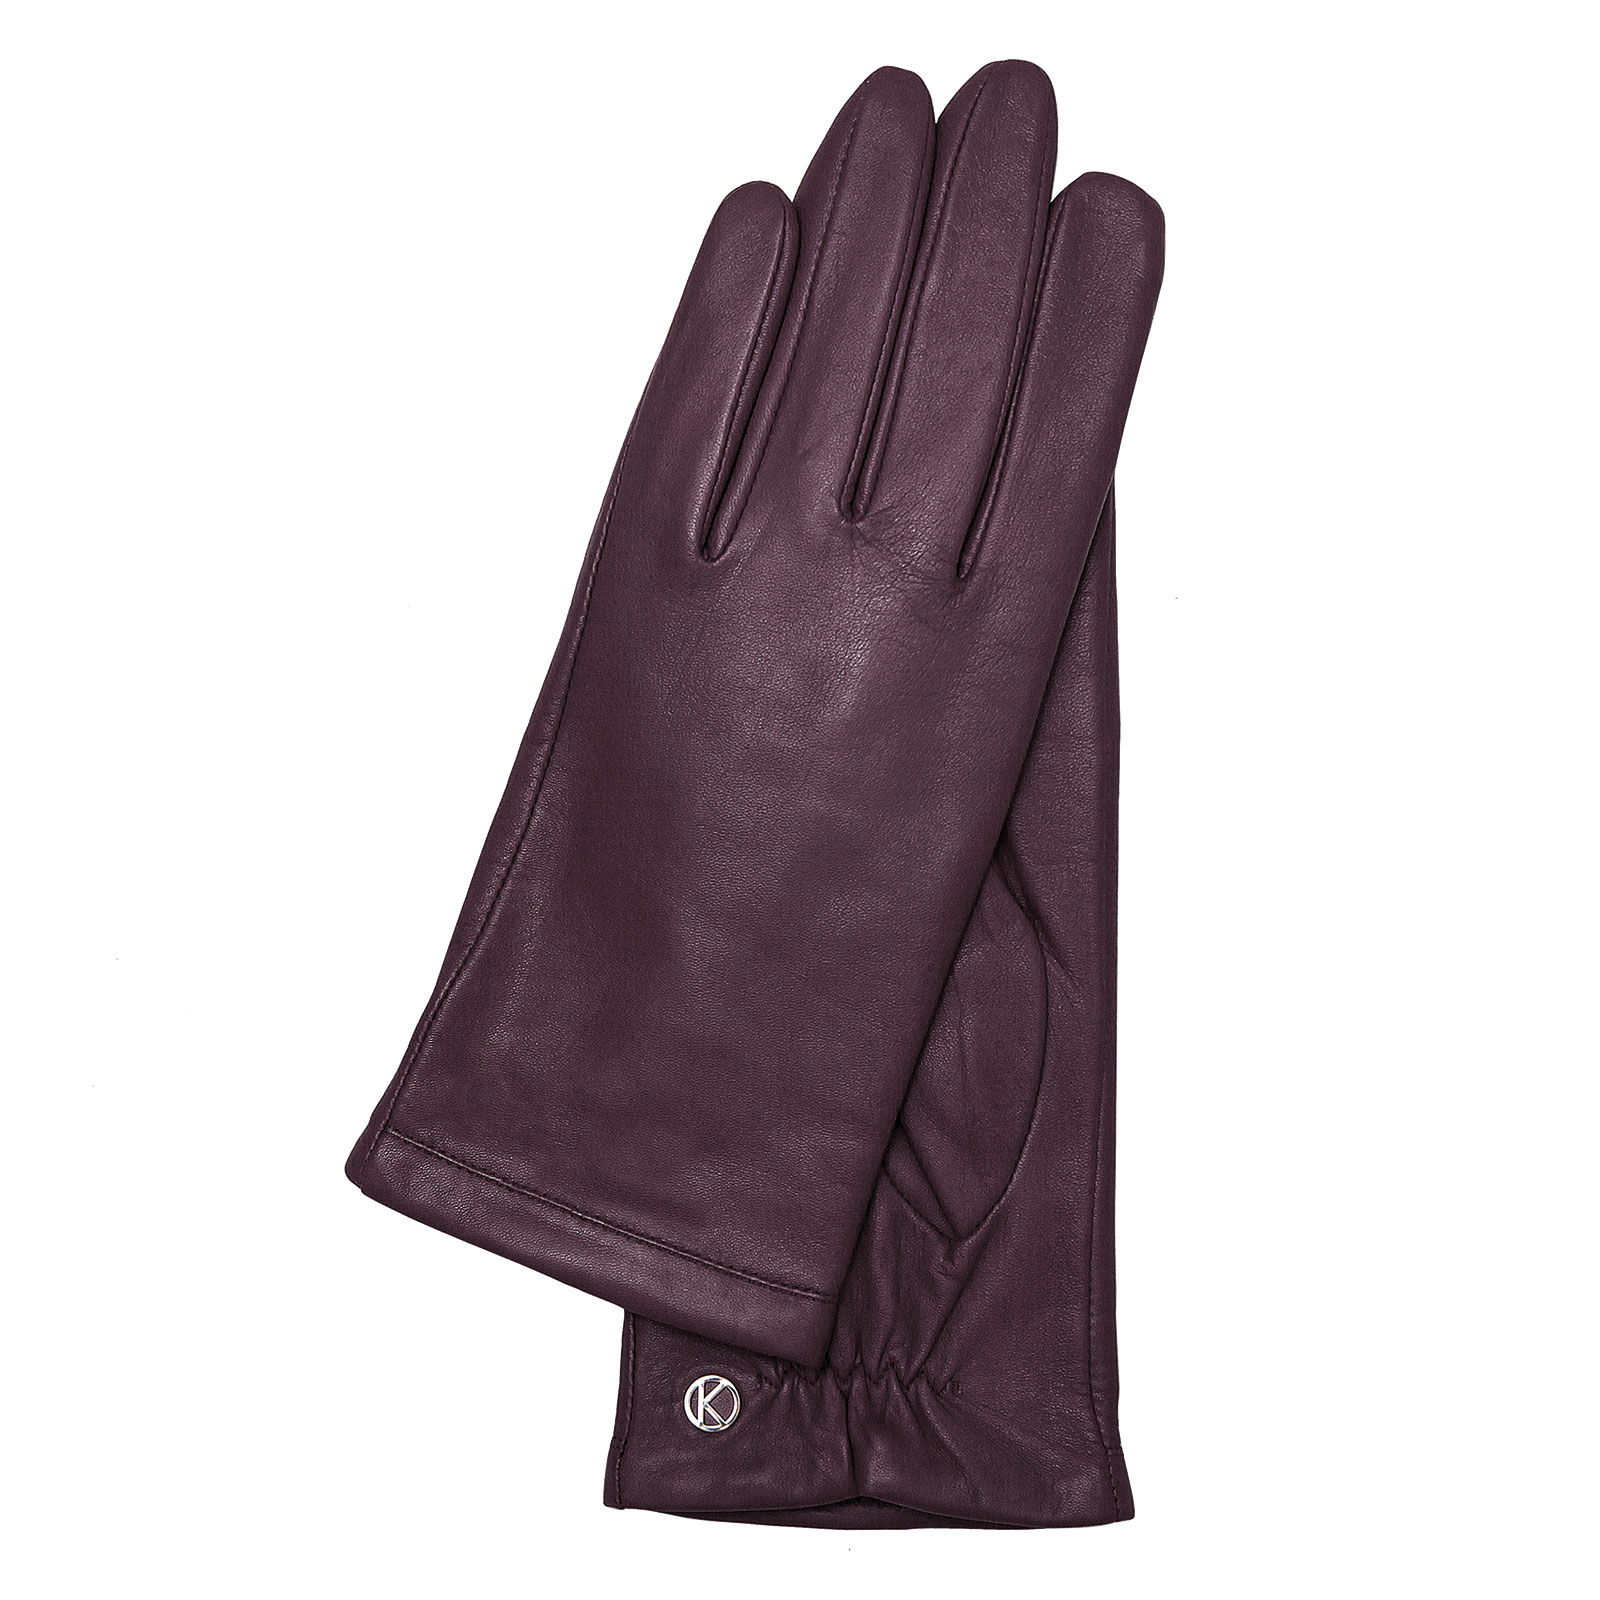 Chelsea179 deep purple